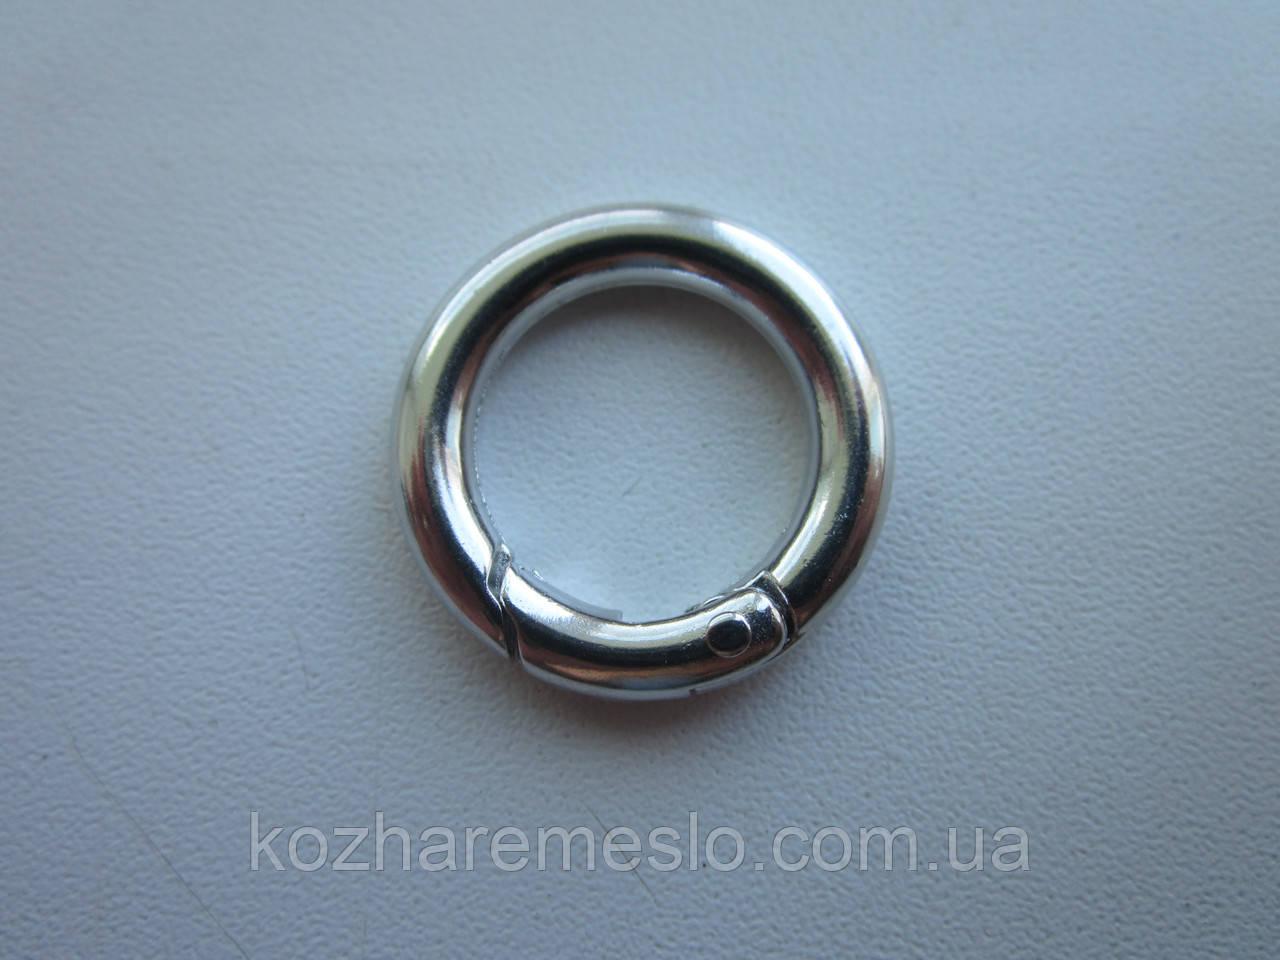 Кольцо - карабин 17 х 4 мм никель